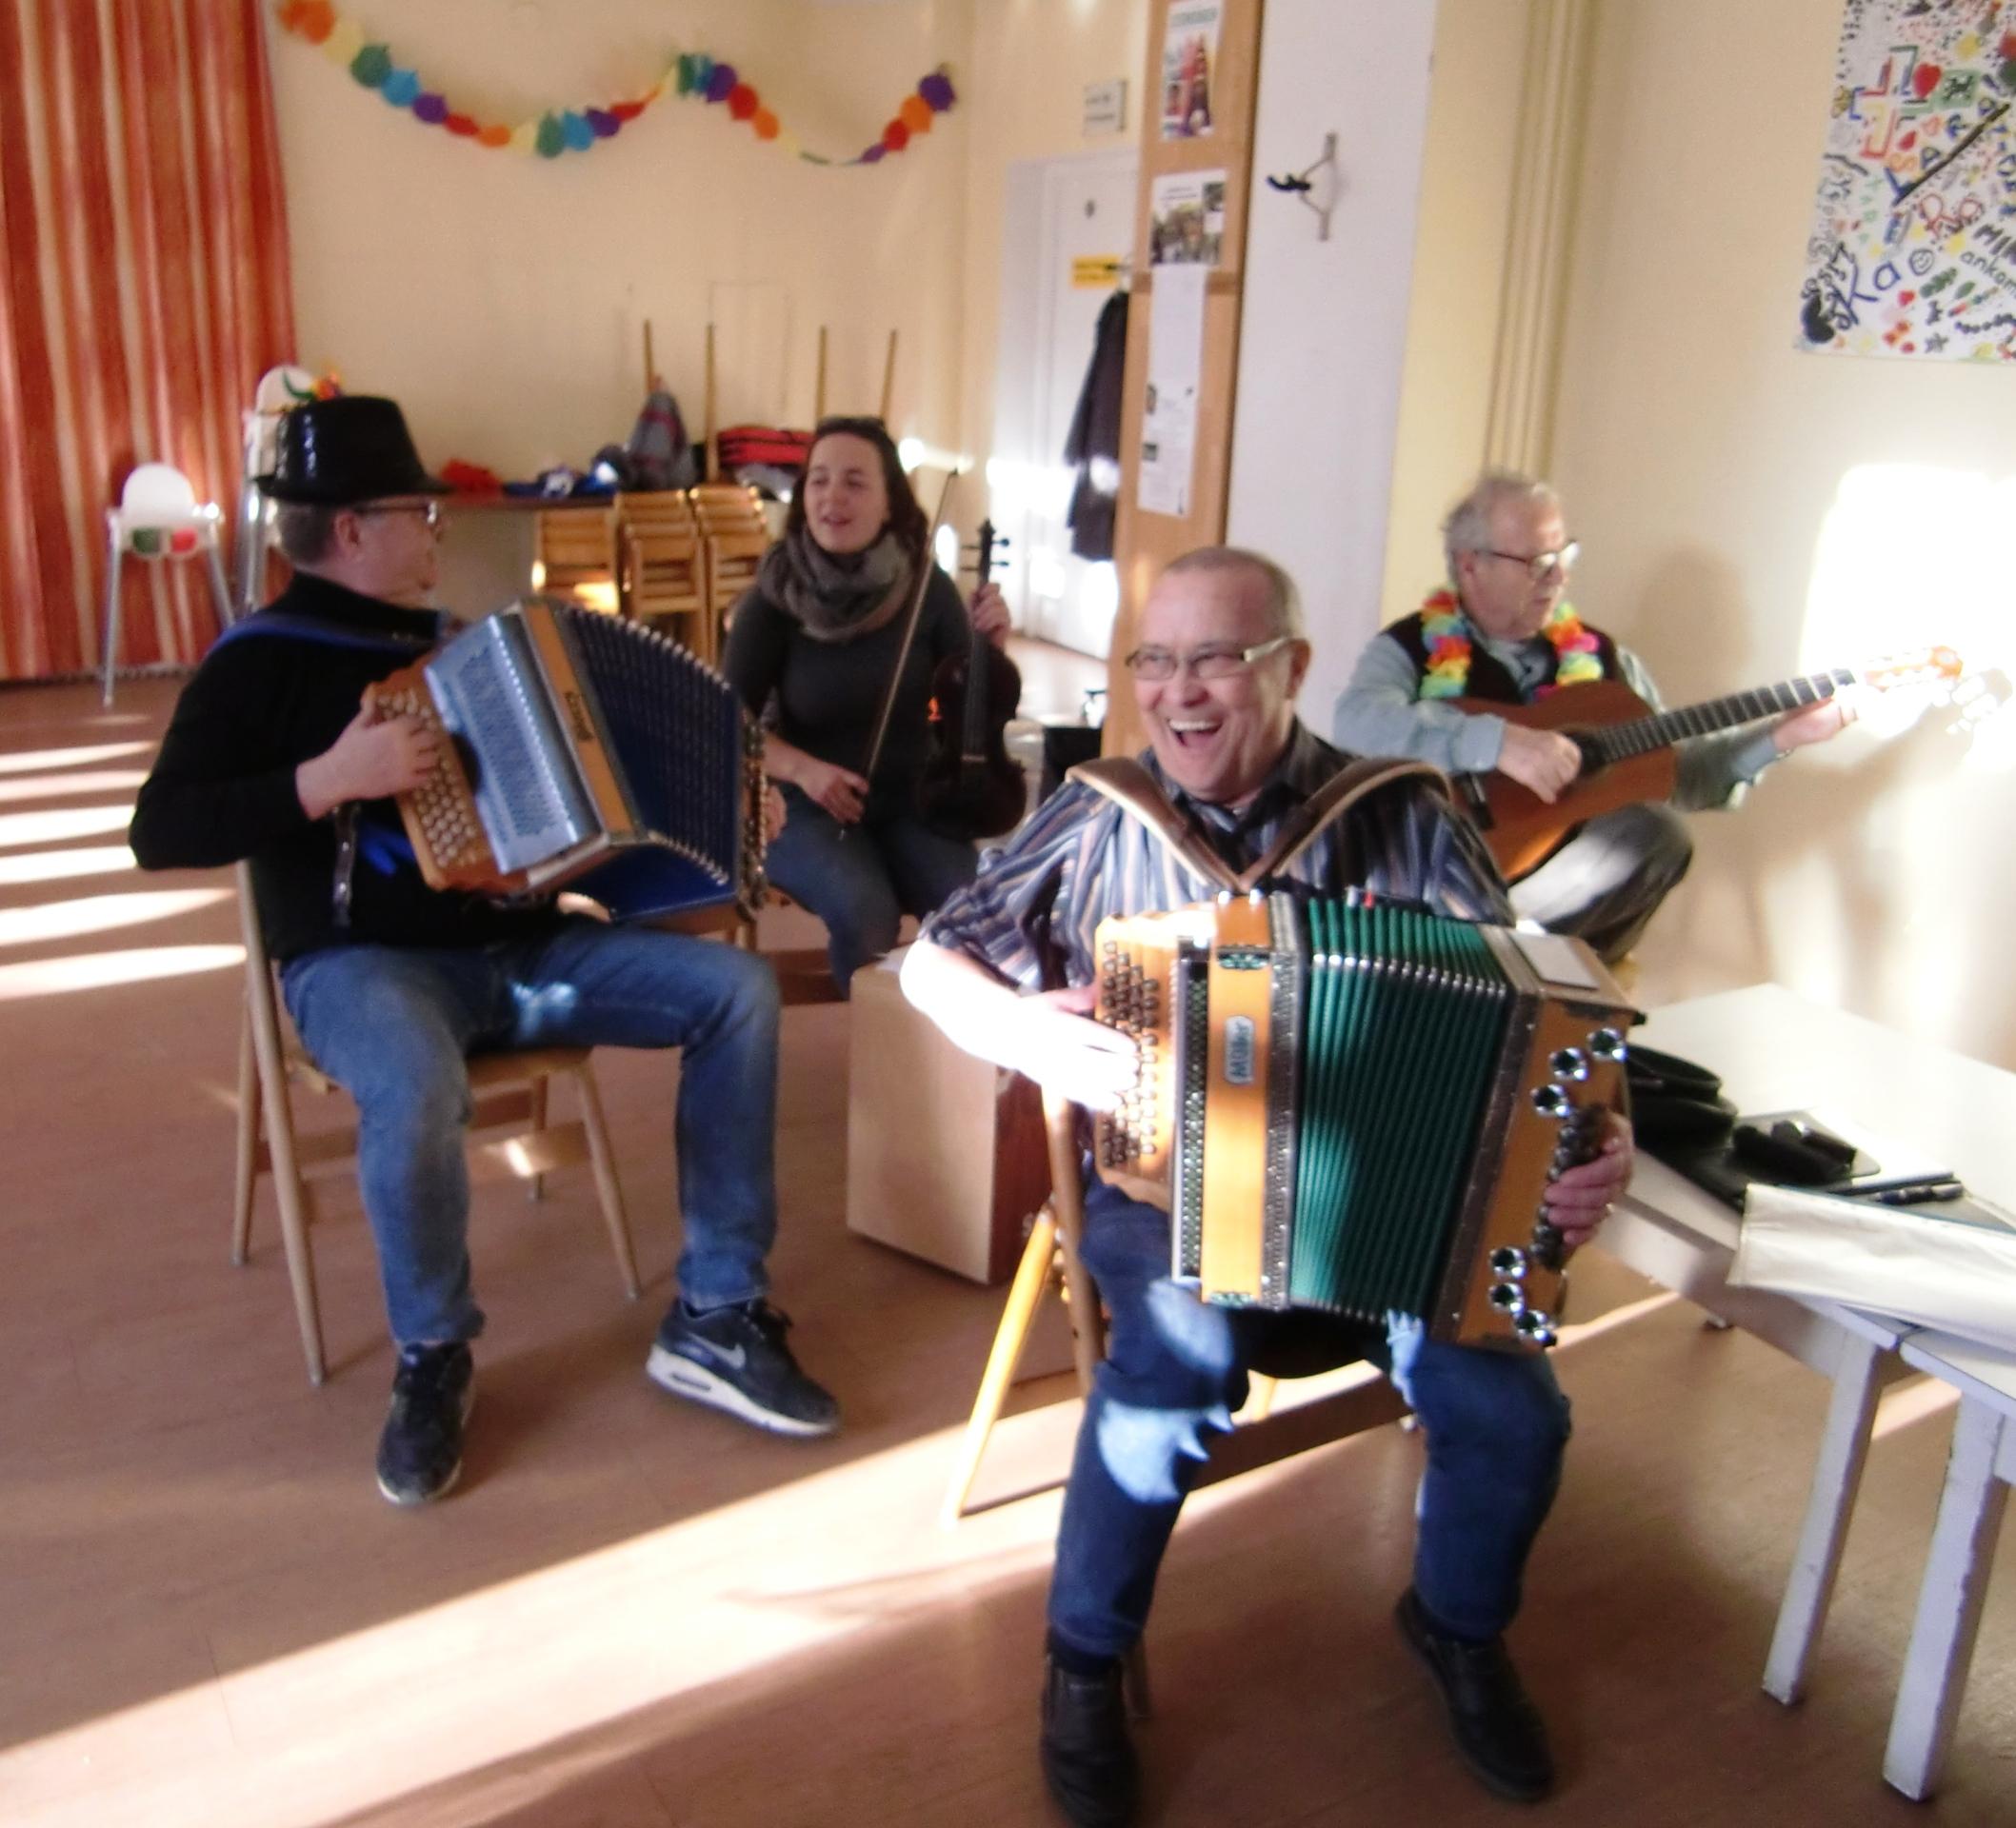 Faschingsfest im Seniorenclub mit Live-Musik!